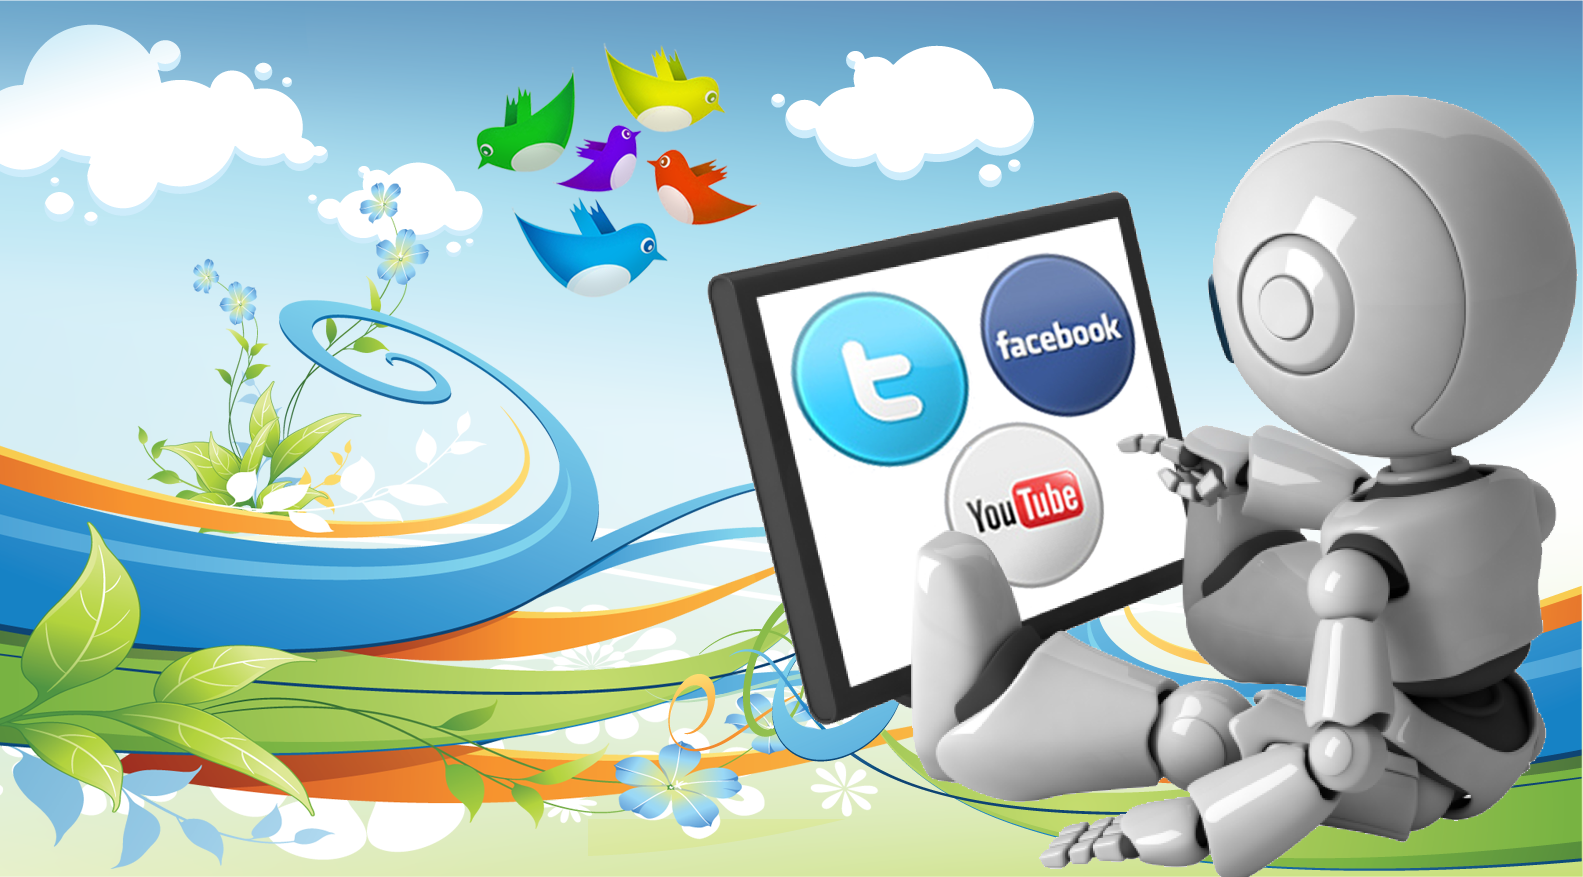 6 Must-have Social Media Marketing Strategies For 2013